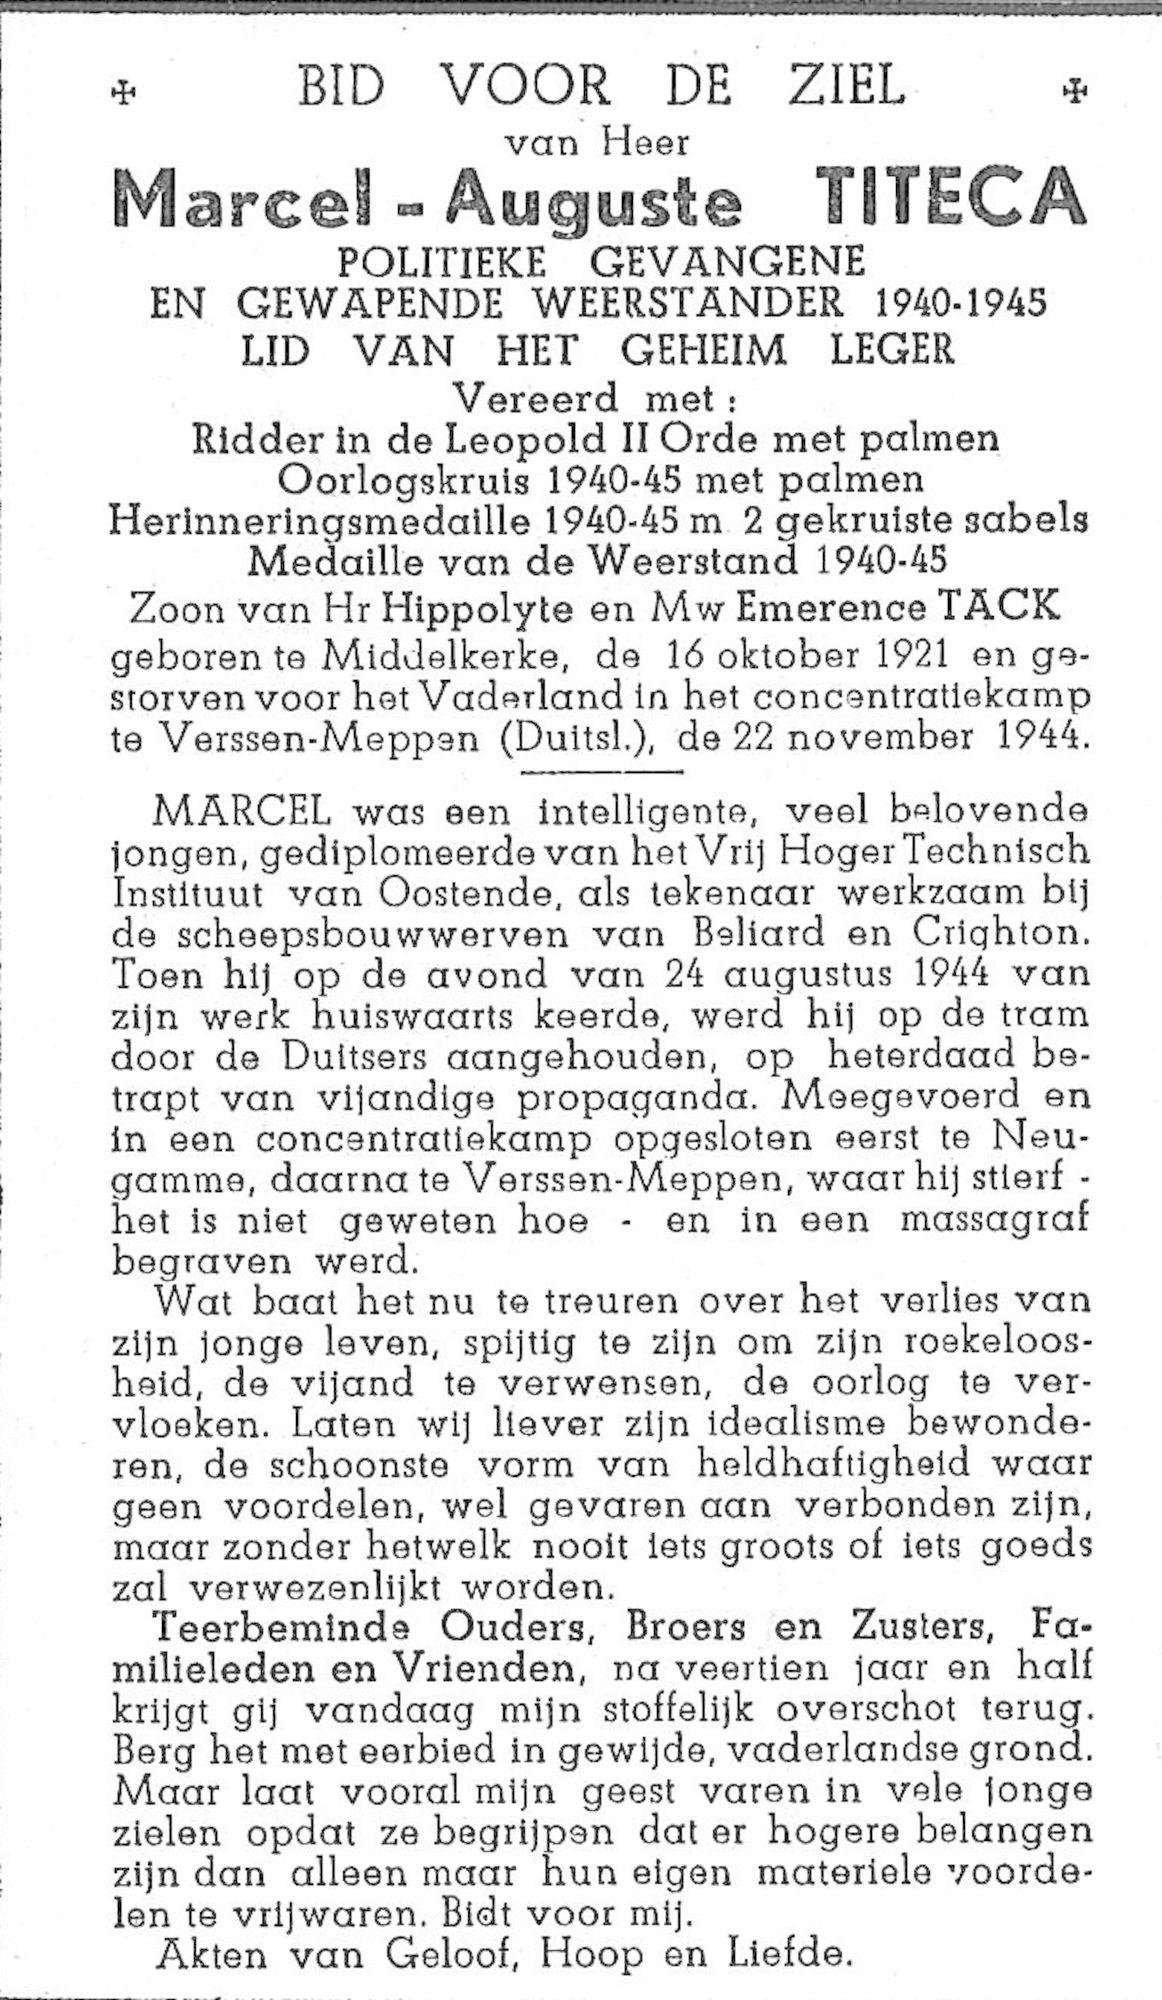 Marcel-Auguste Titeca